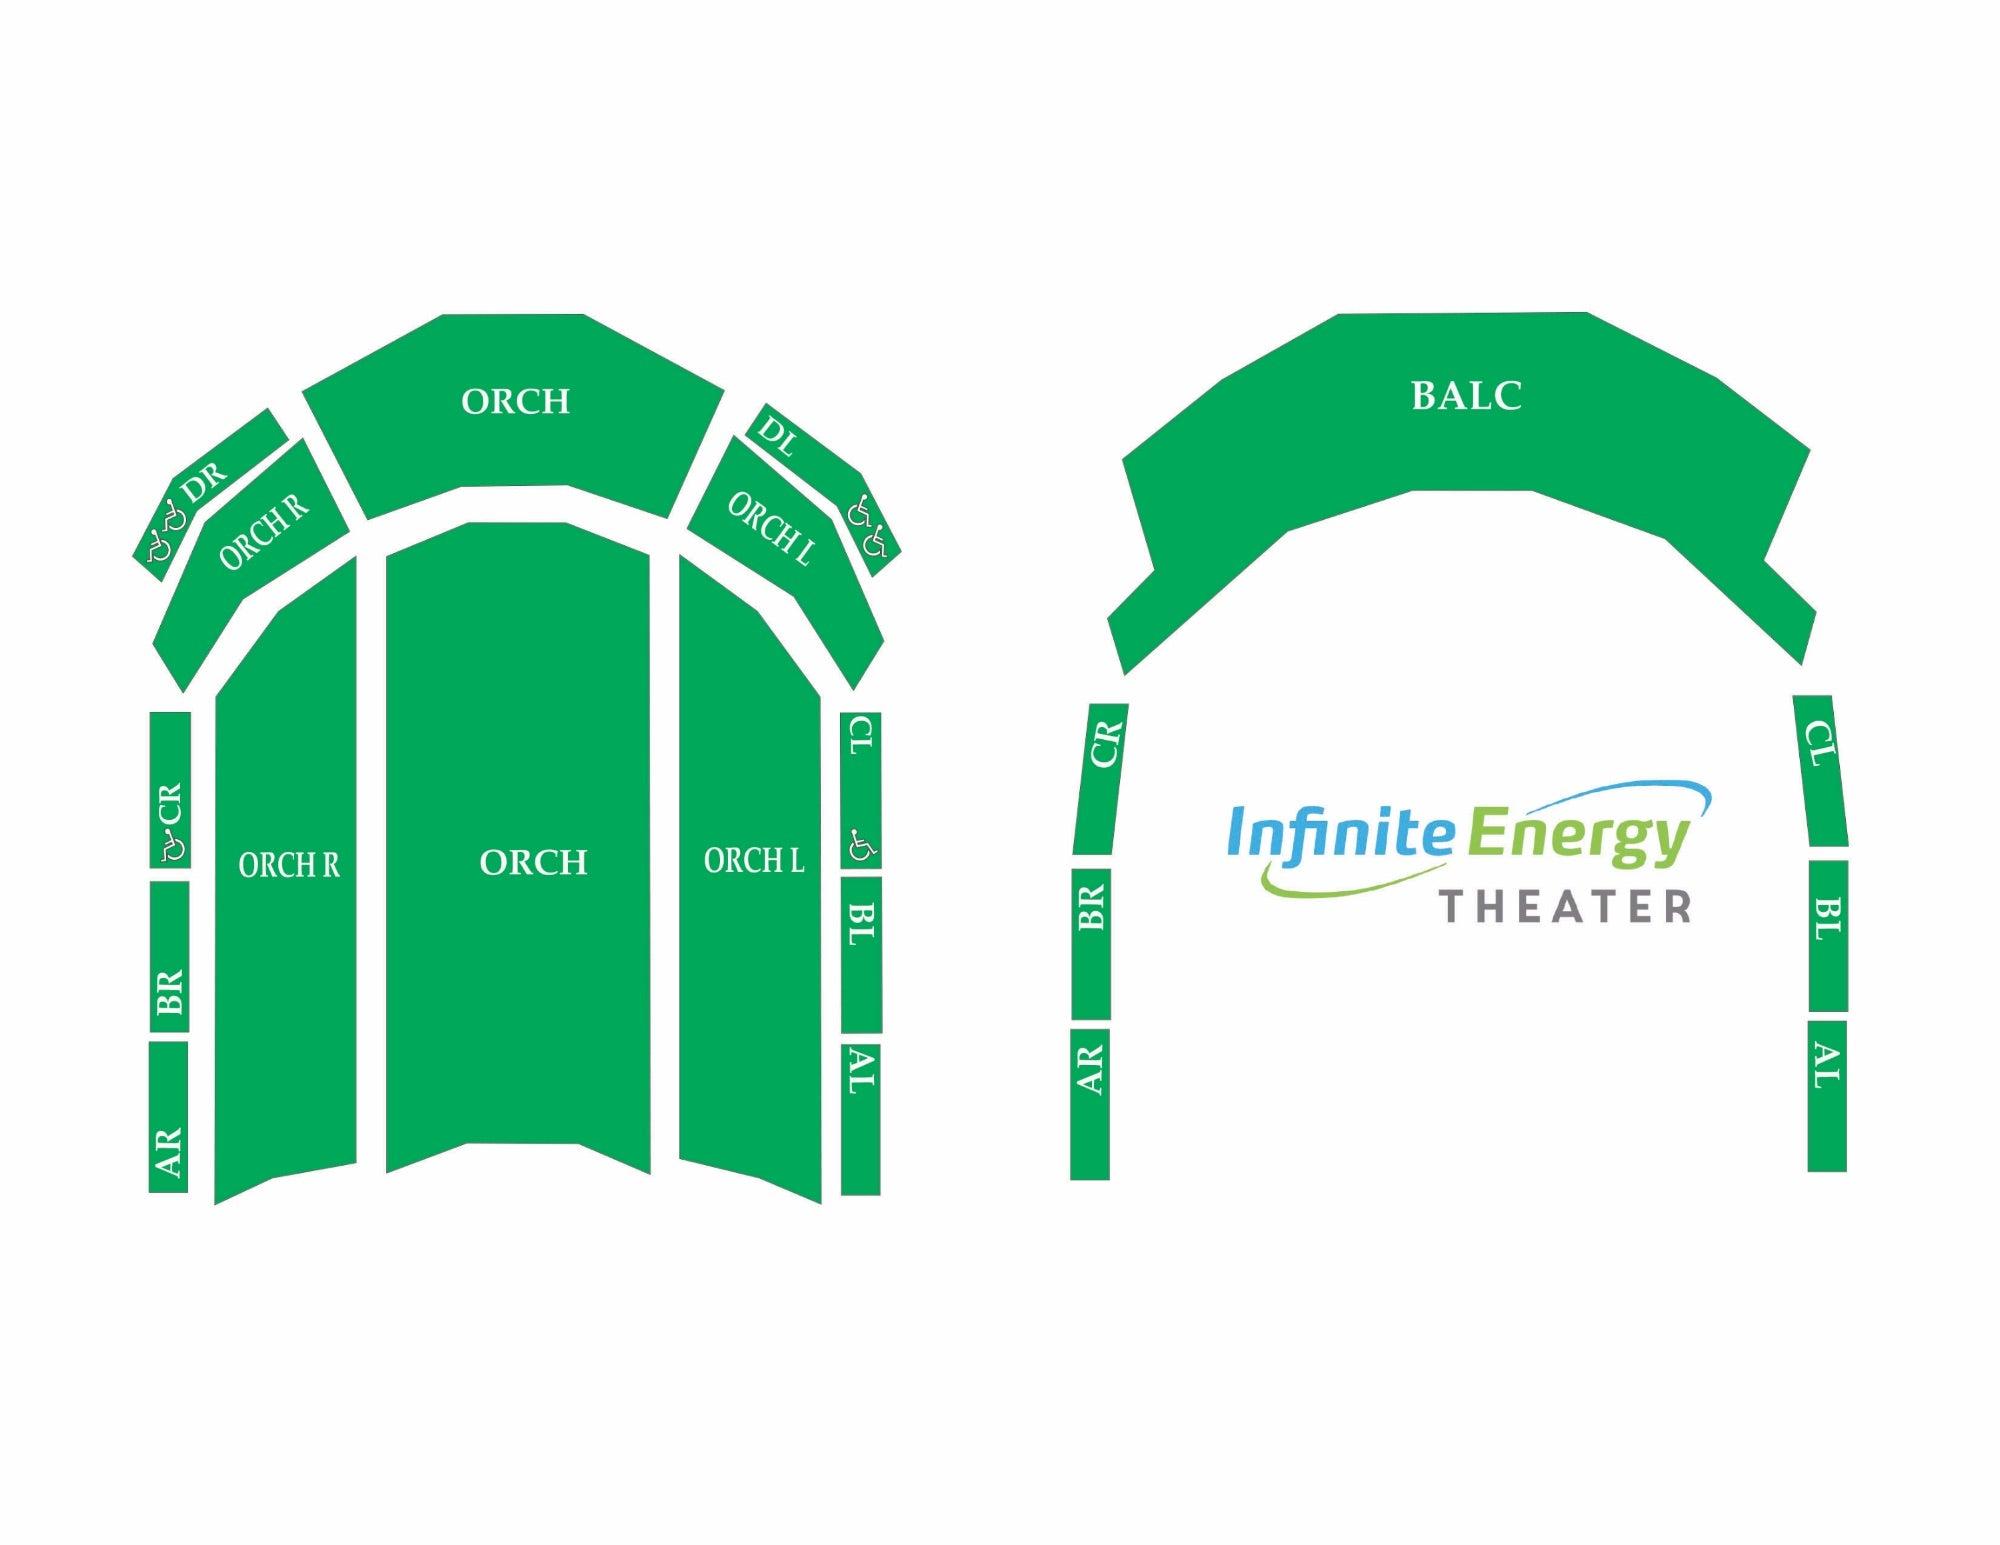 Infinite Energy Theater Infinite Energy Center